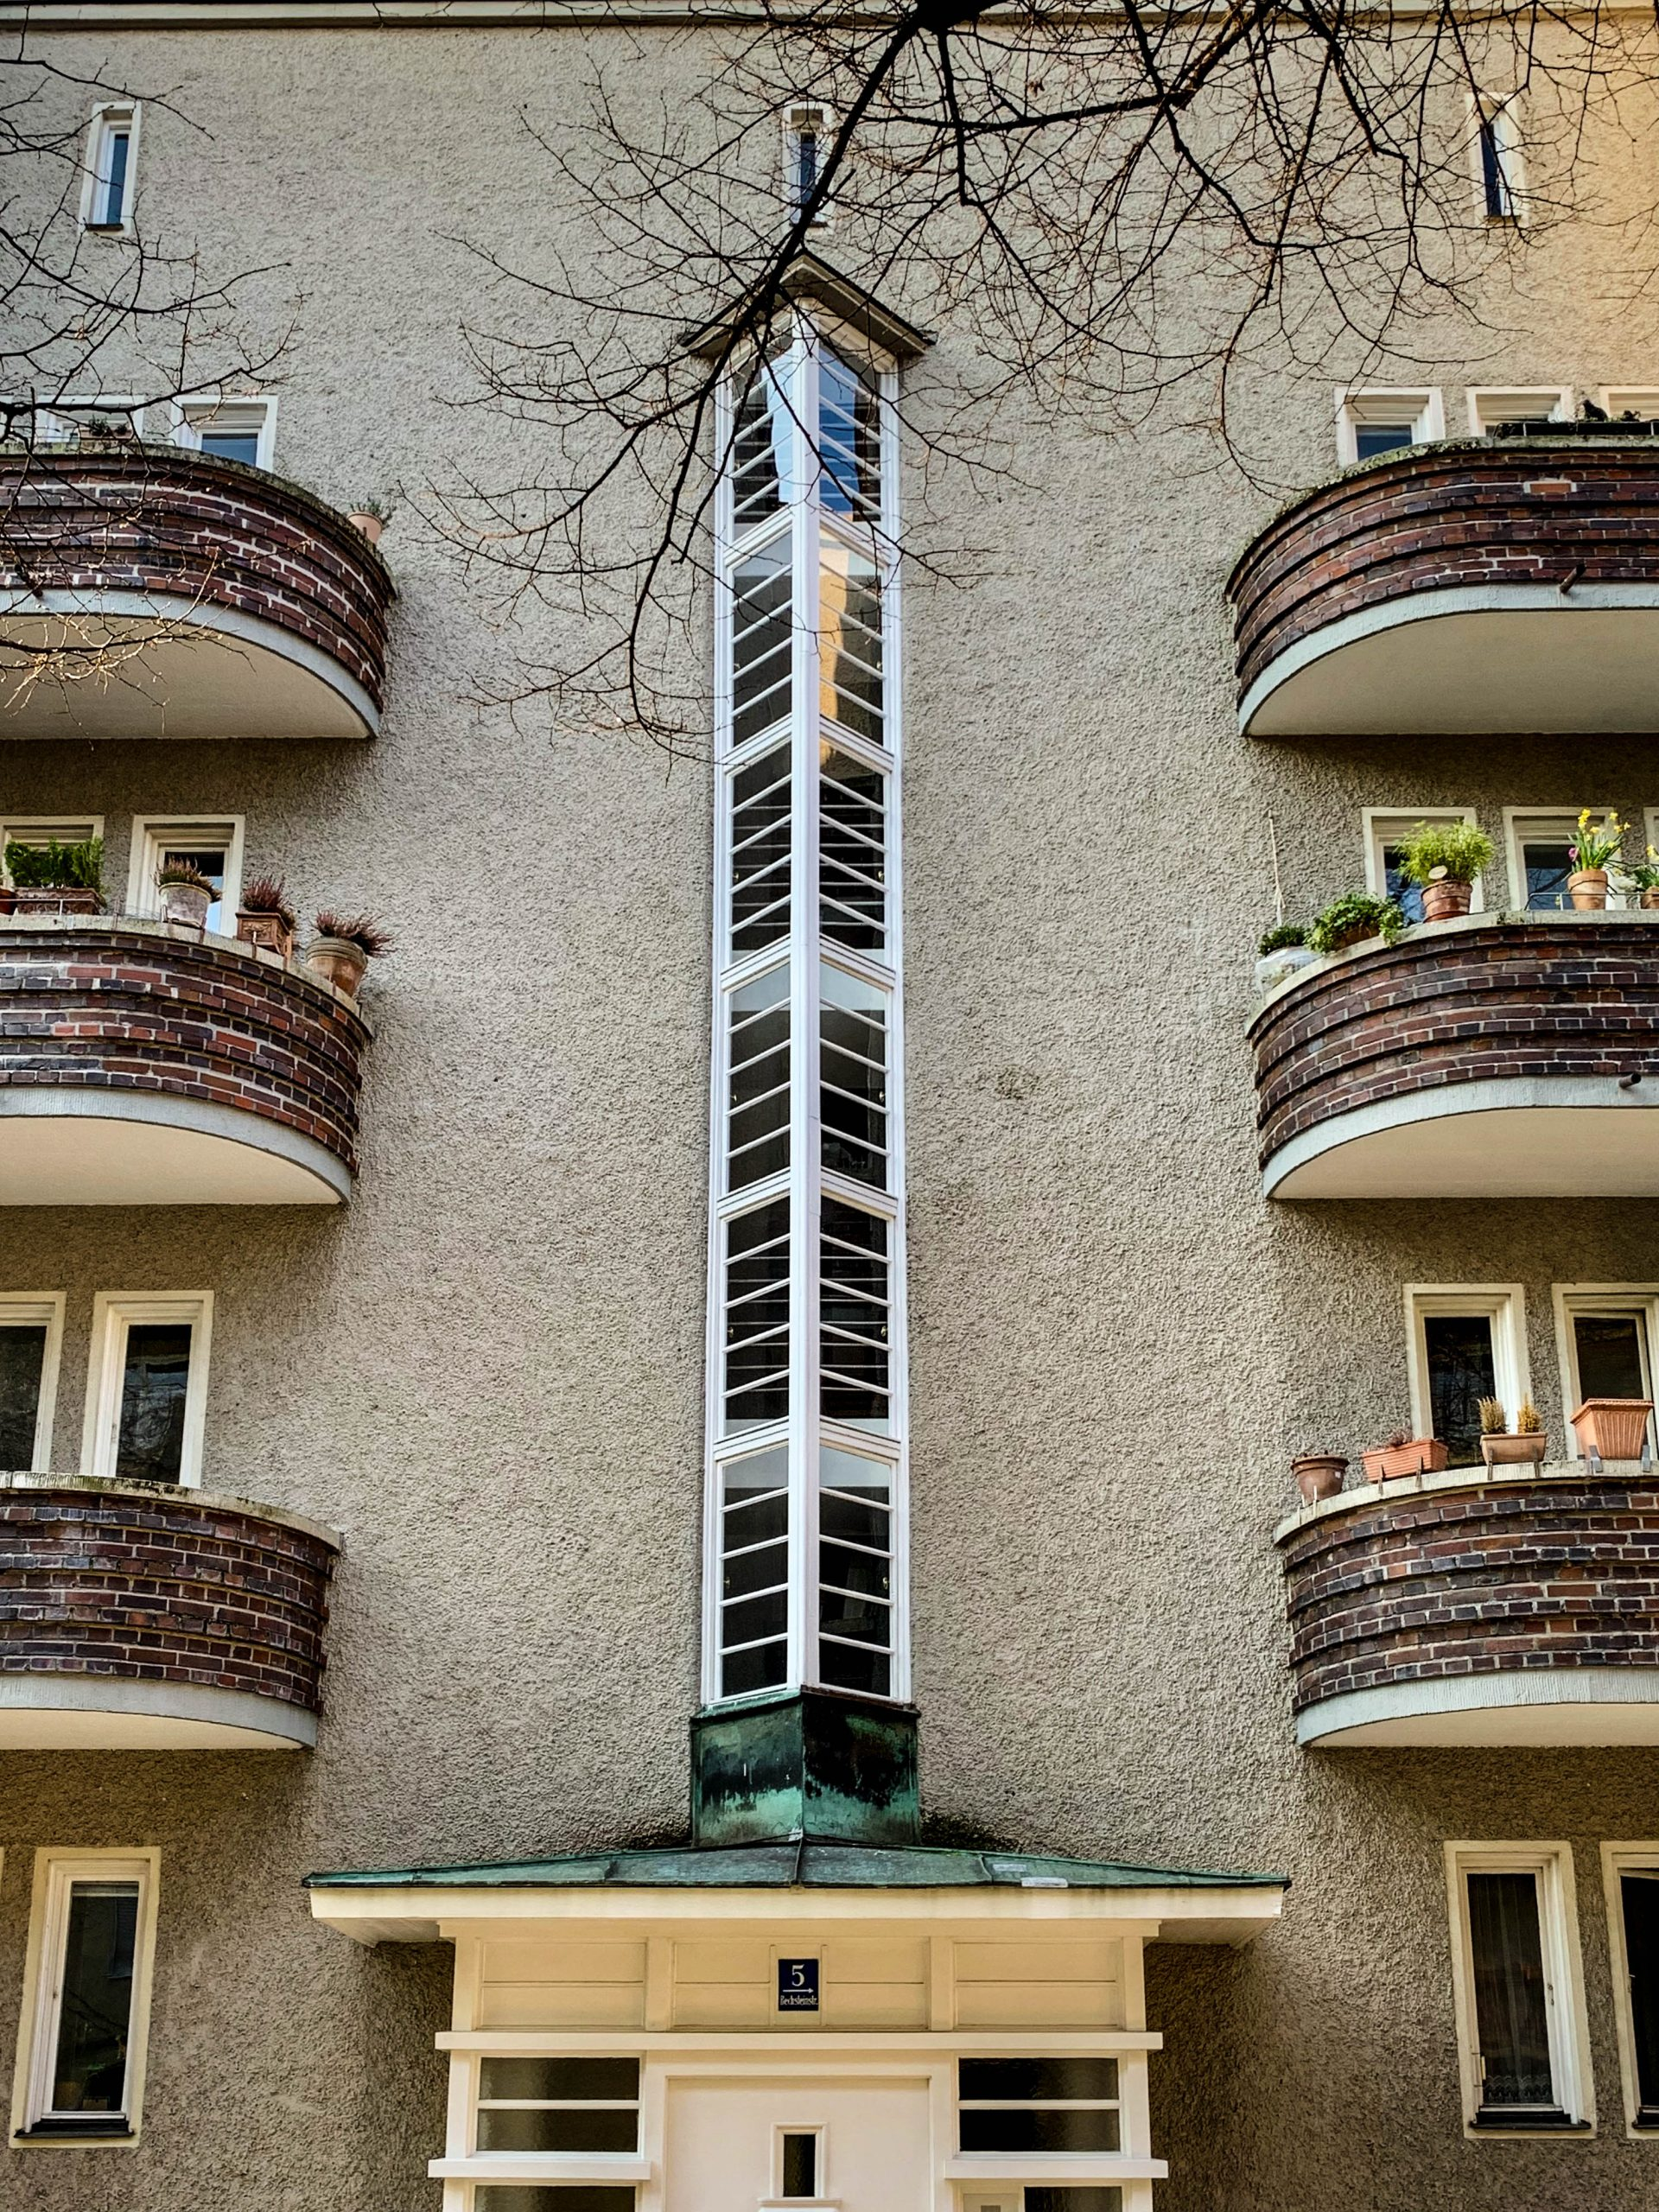 Residential complex, 1929-1930. Architects: Otho Orlando Kurz, Eduard Herbert